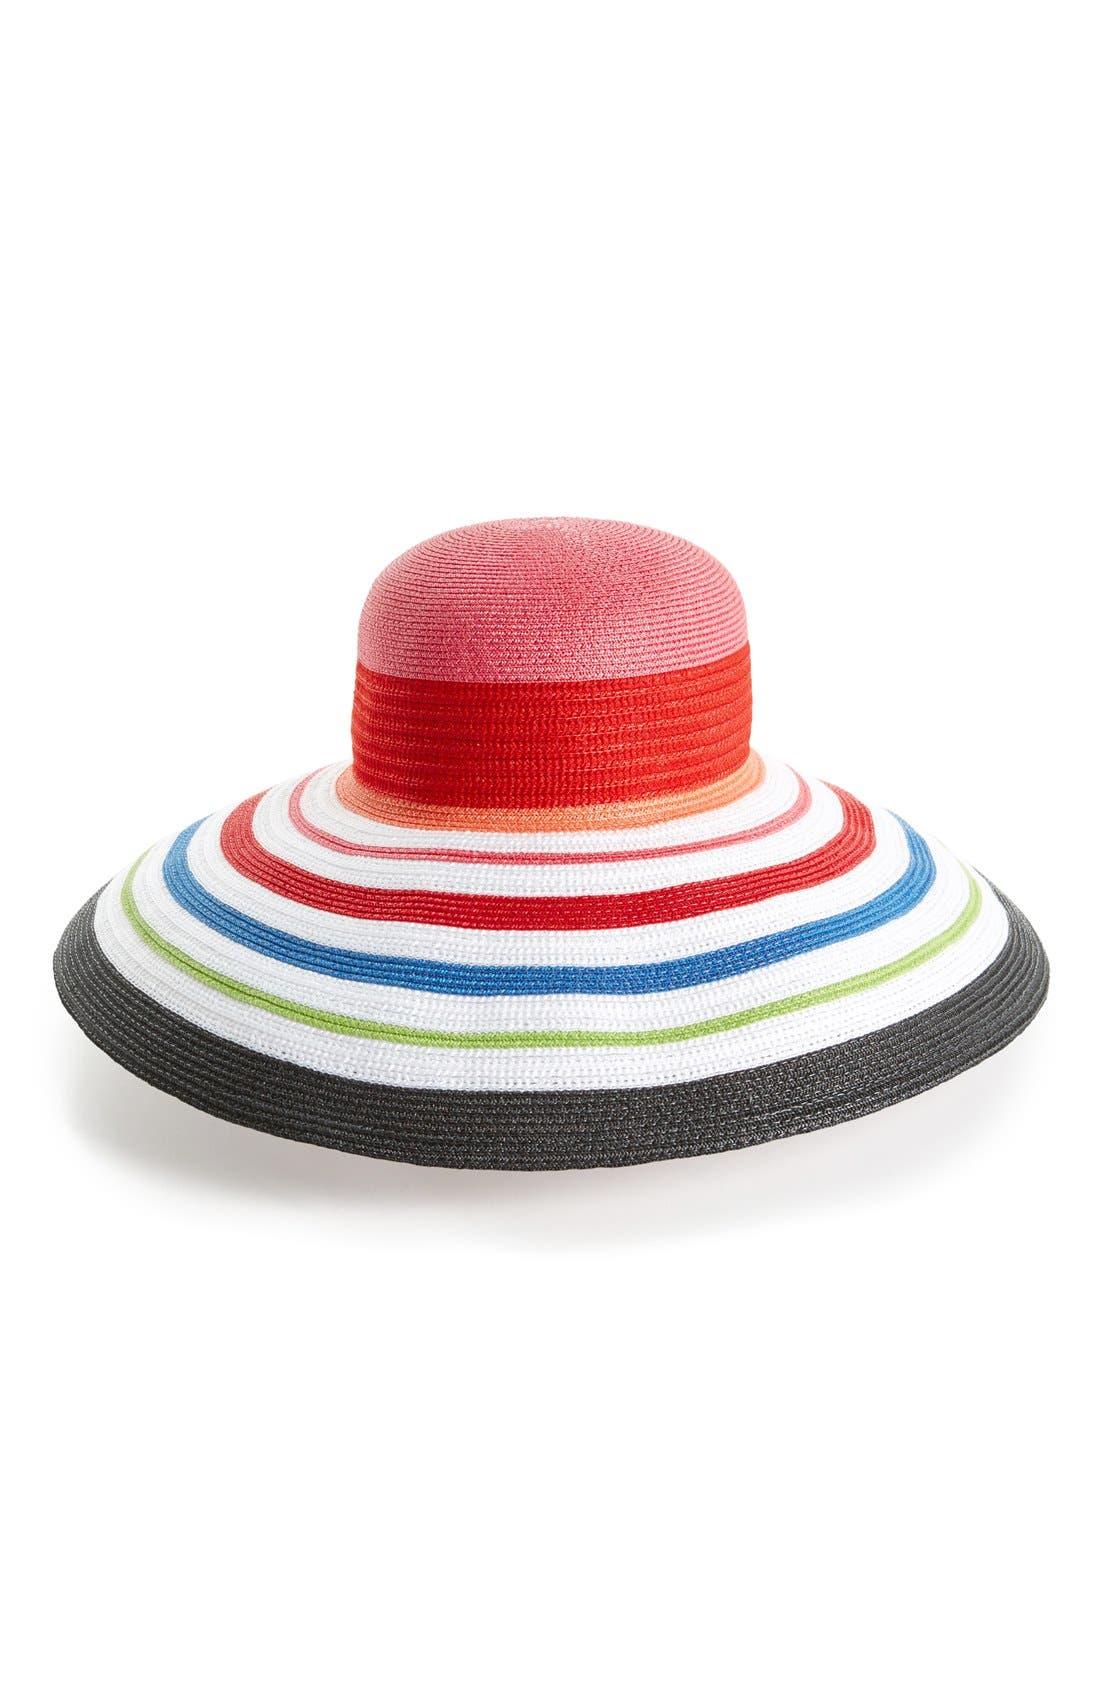 Alternate Image 1 Selected - Laundry by Shelli Segal 'Chloe' Floppy Hat